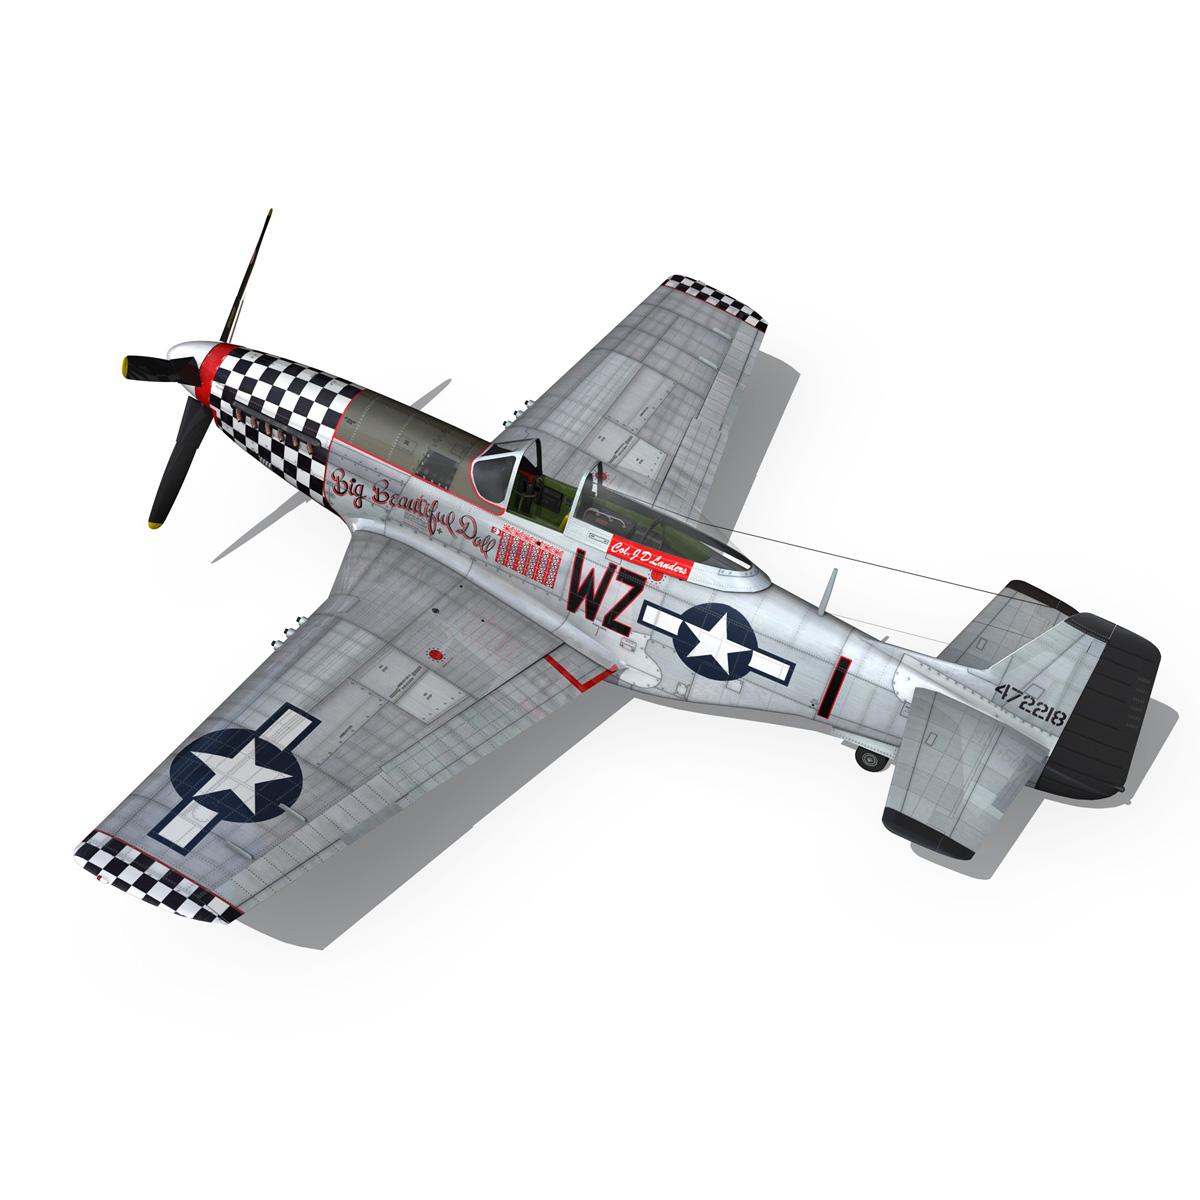 north american p-51d mustang – big beautiful doll 3d model fbx c4d lwo obj 282563